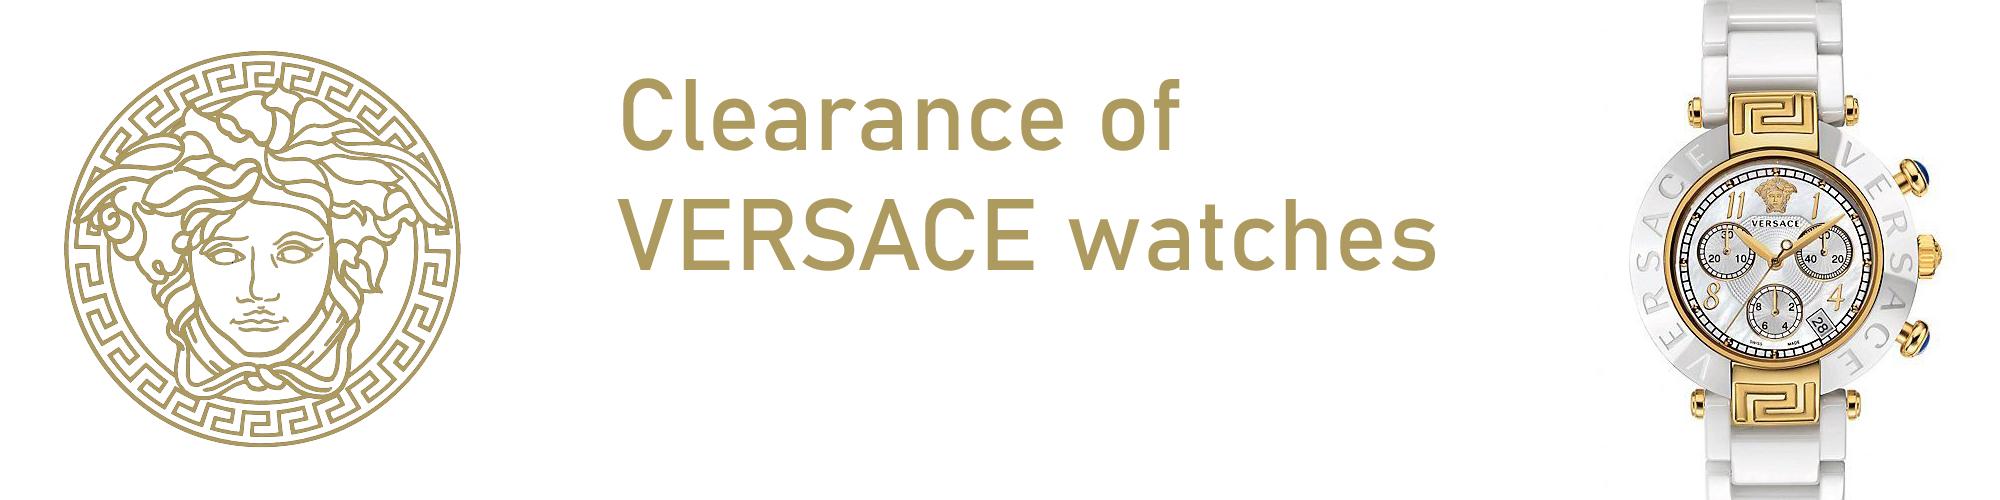 Versace_Watches